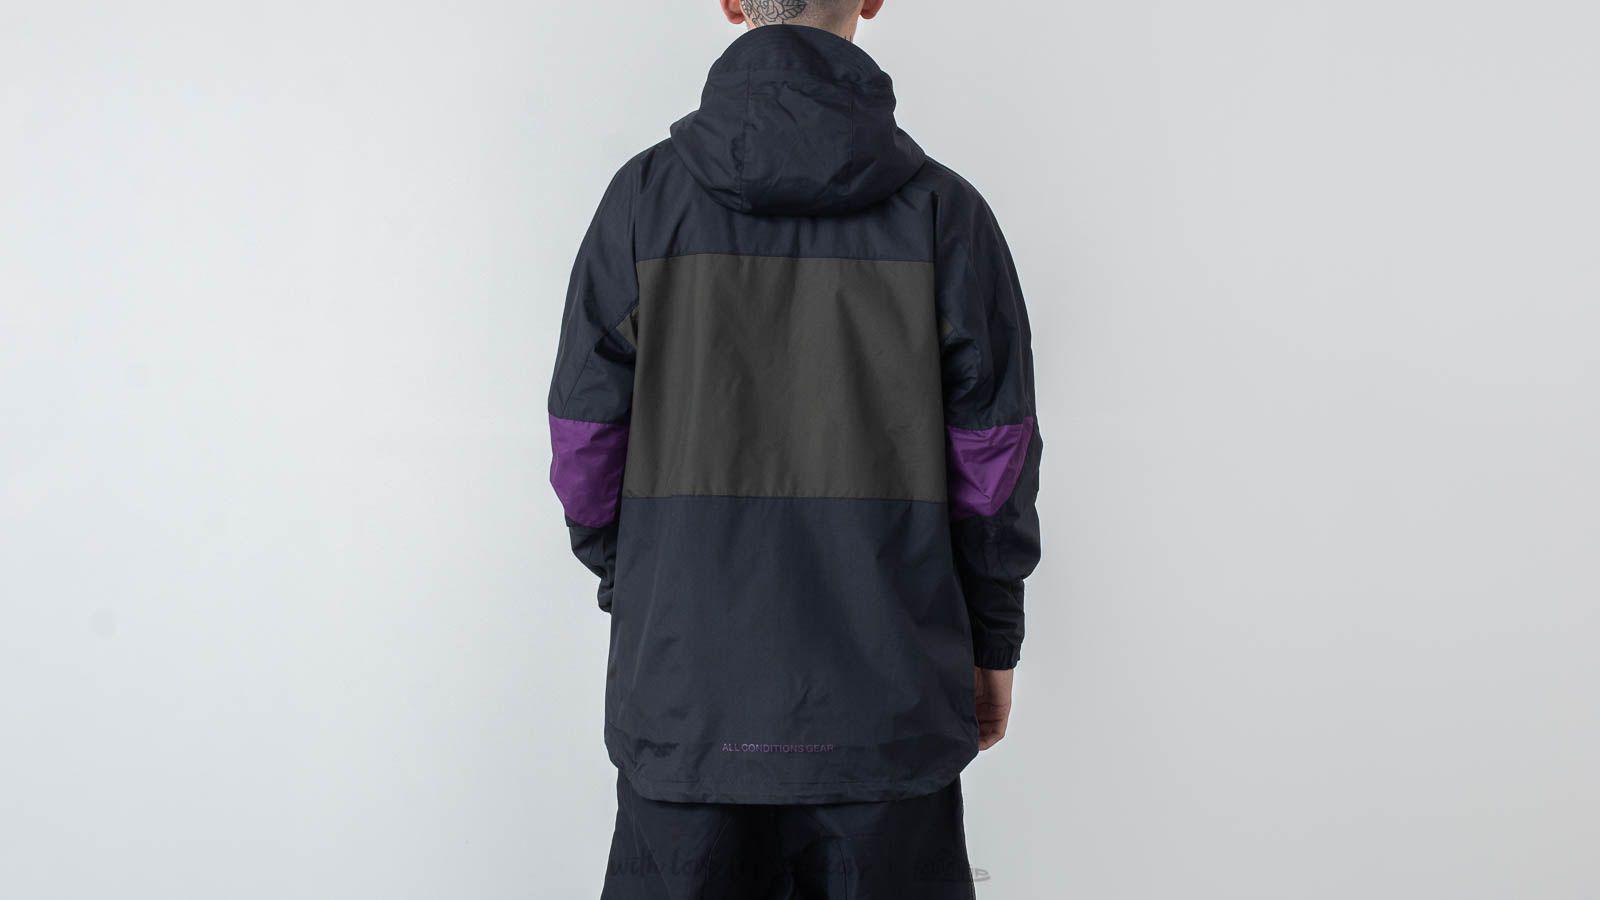 d8a586d49 Nike Acg Anorak Black/ Sequoia in Black for Men - Lyst